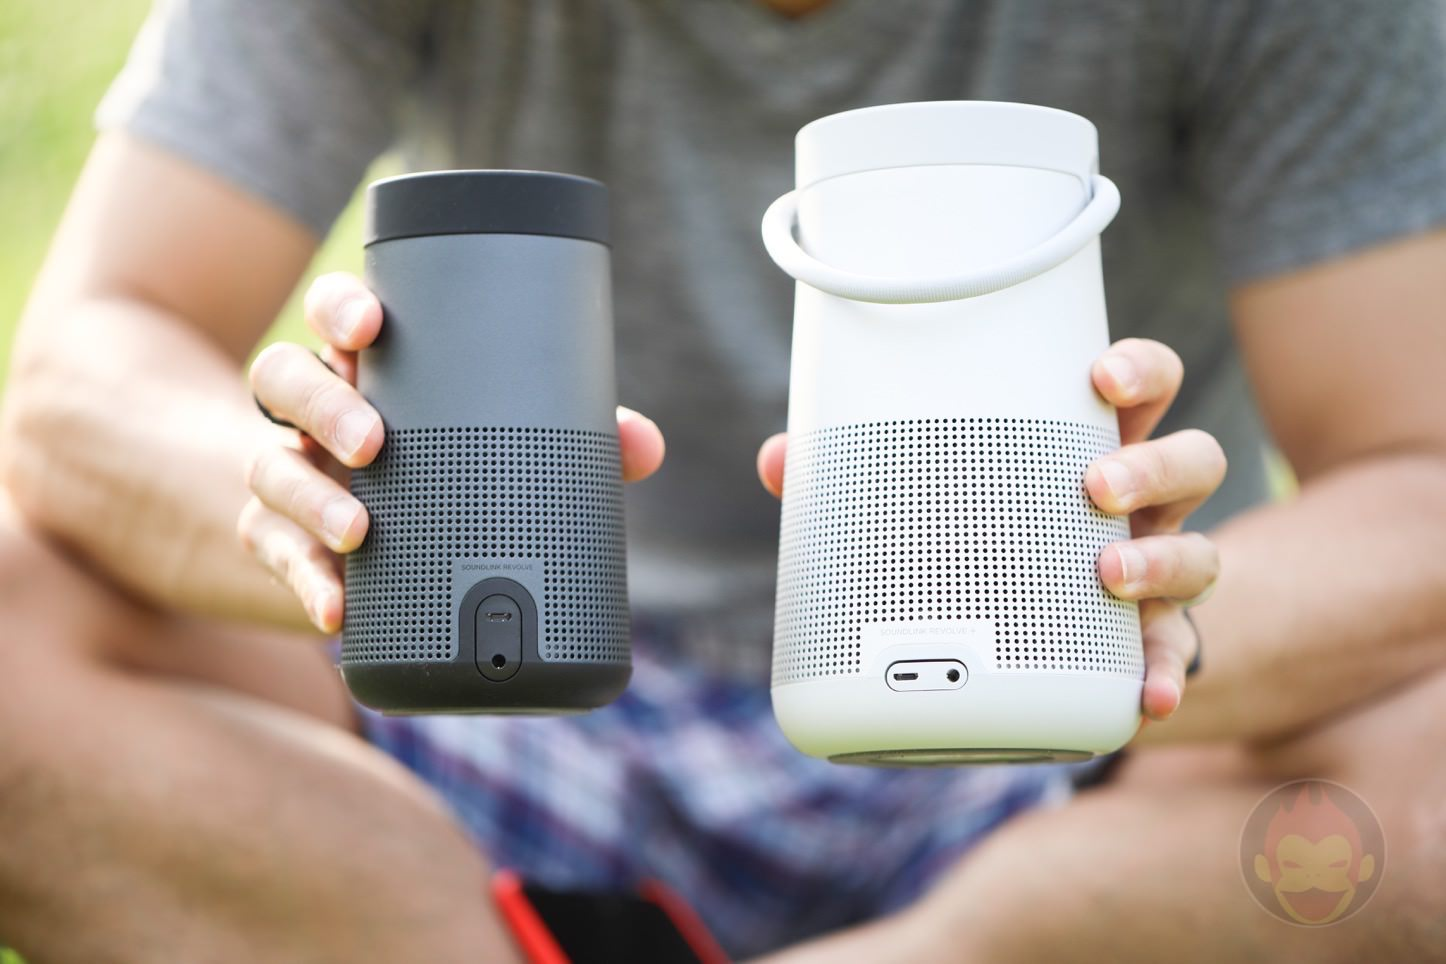 Bose-SoundLink-Revolve-12.JPG